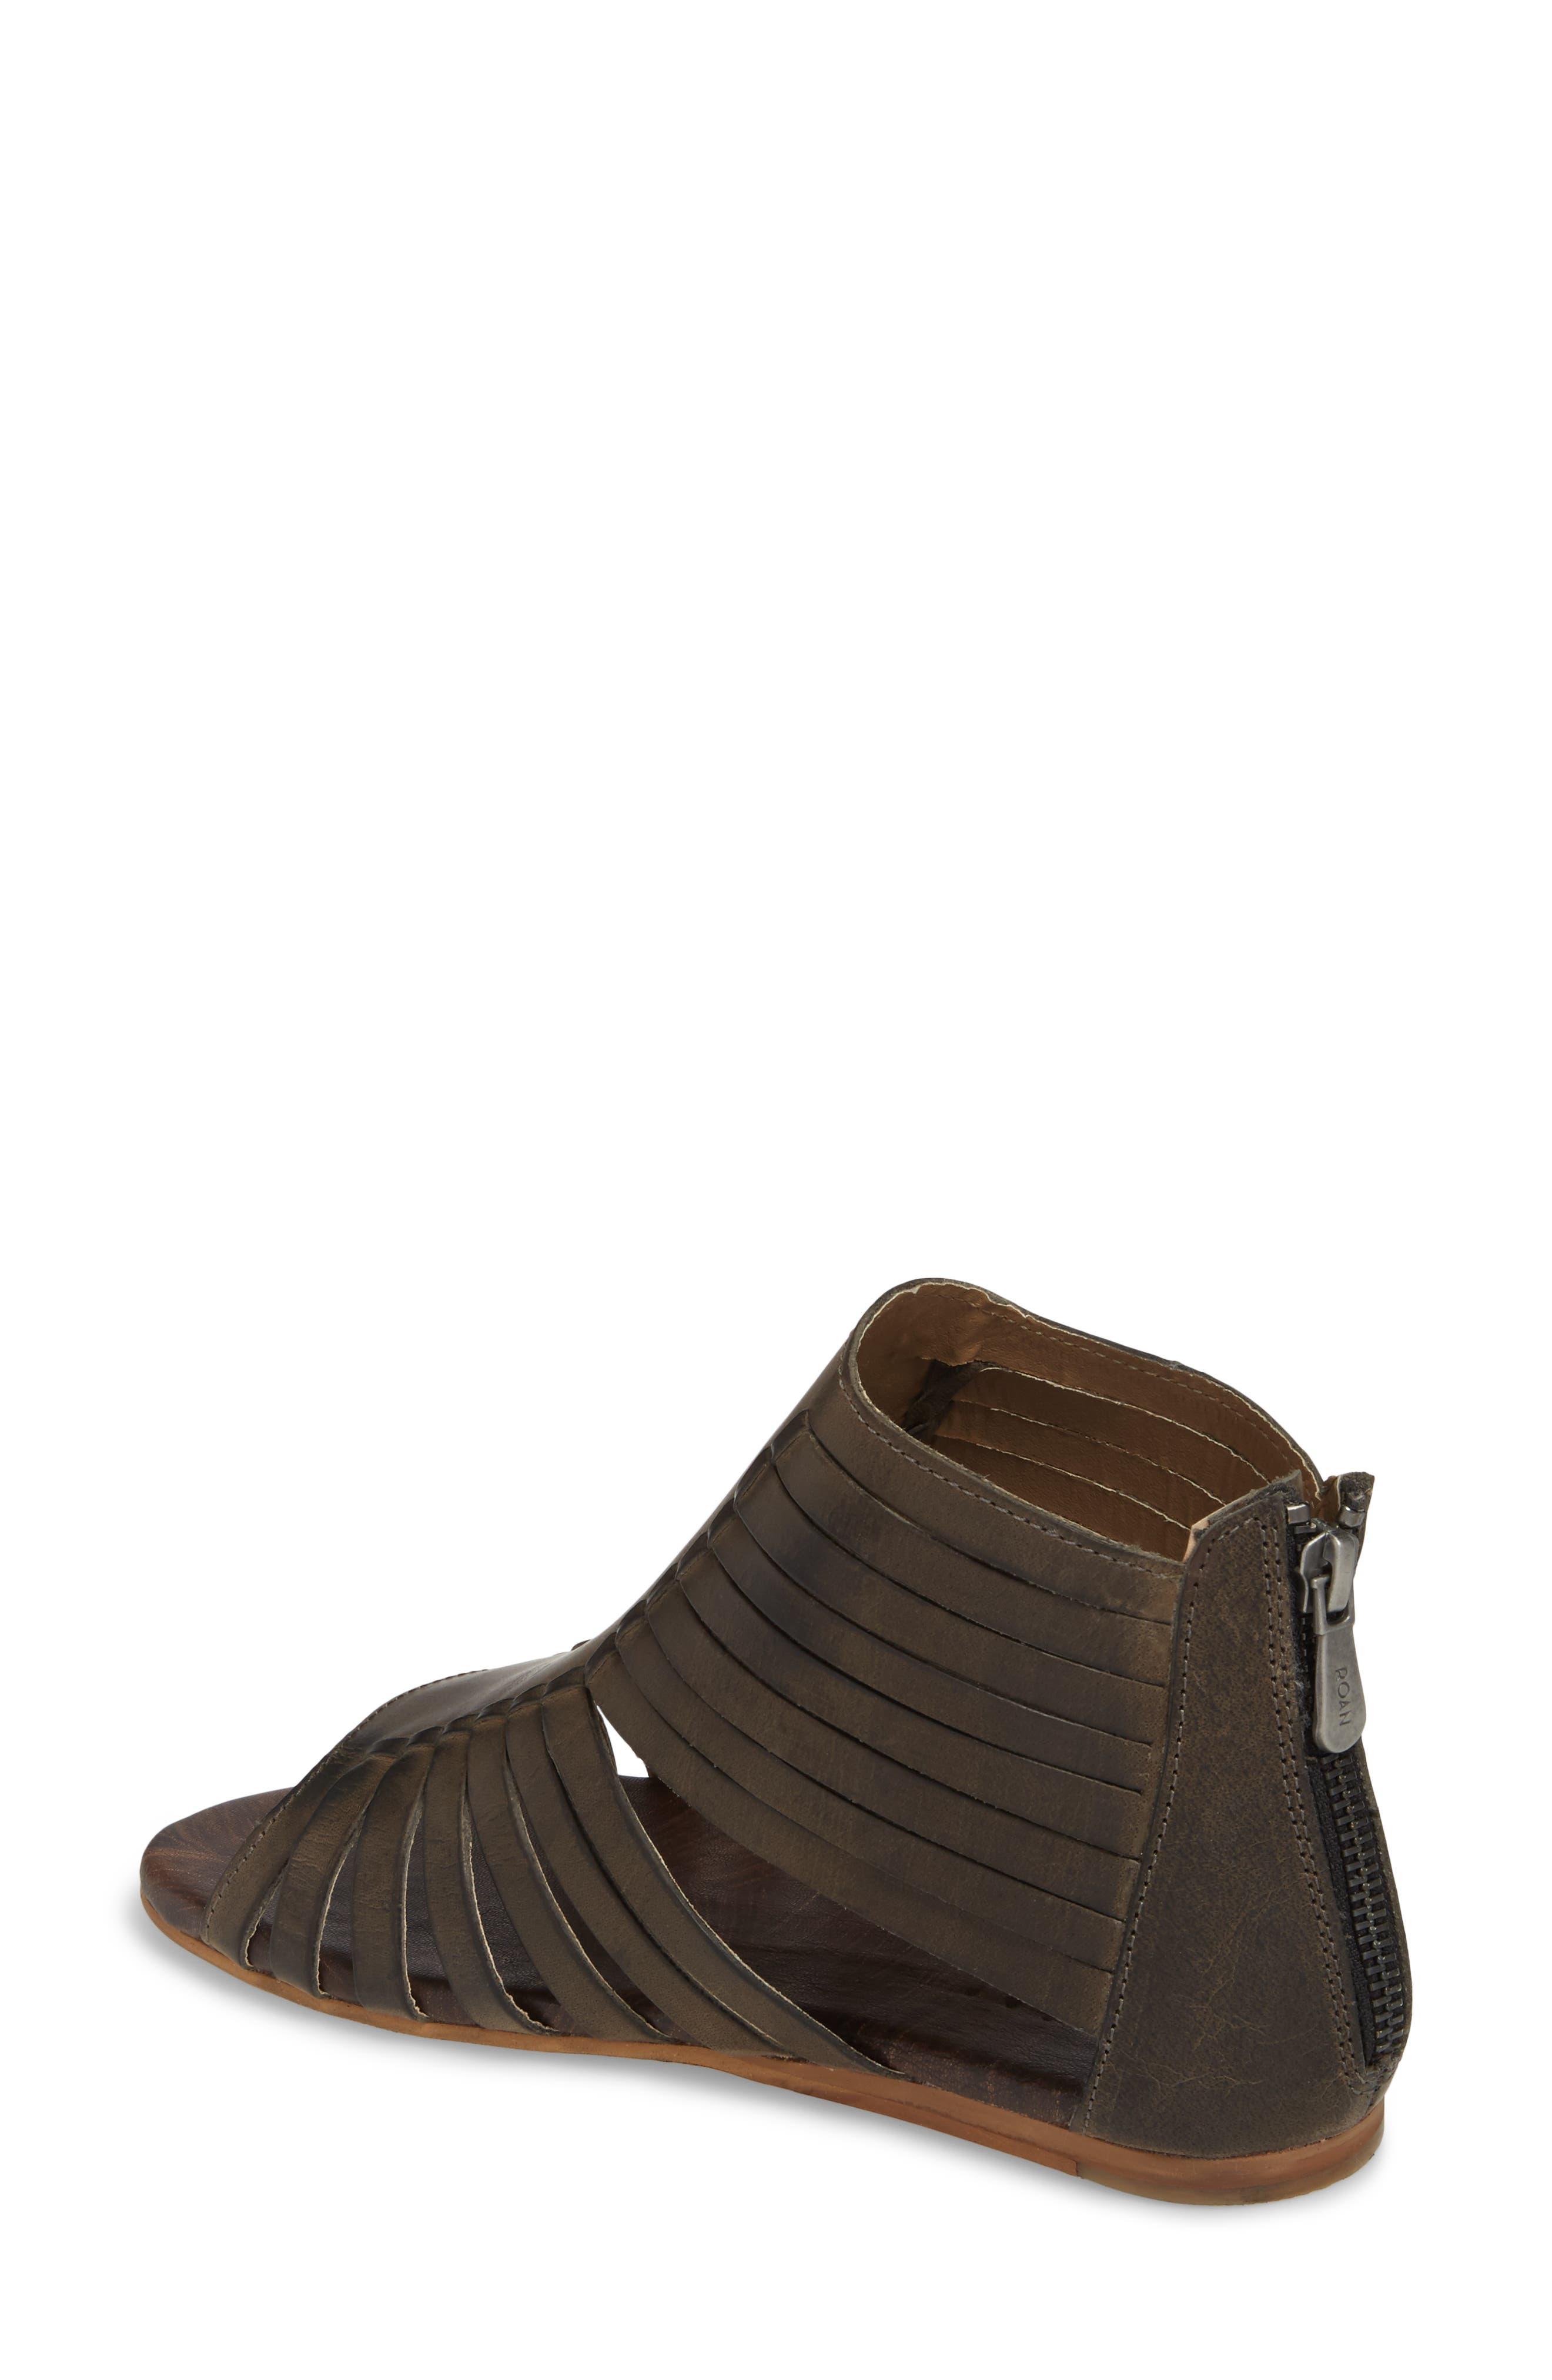 Pearl Gladiator Sandal,                             Alternate thumbnail 2, color,                             Black Greenland